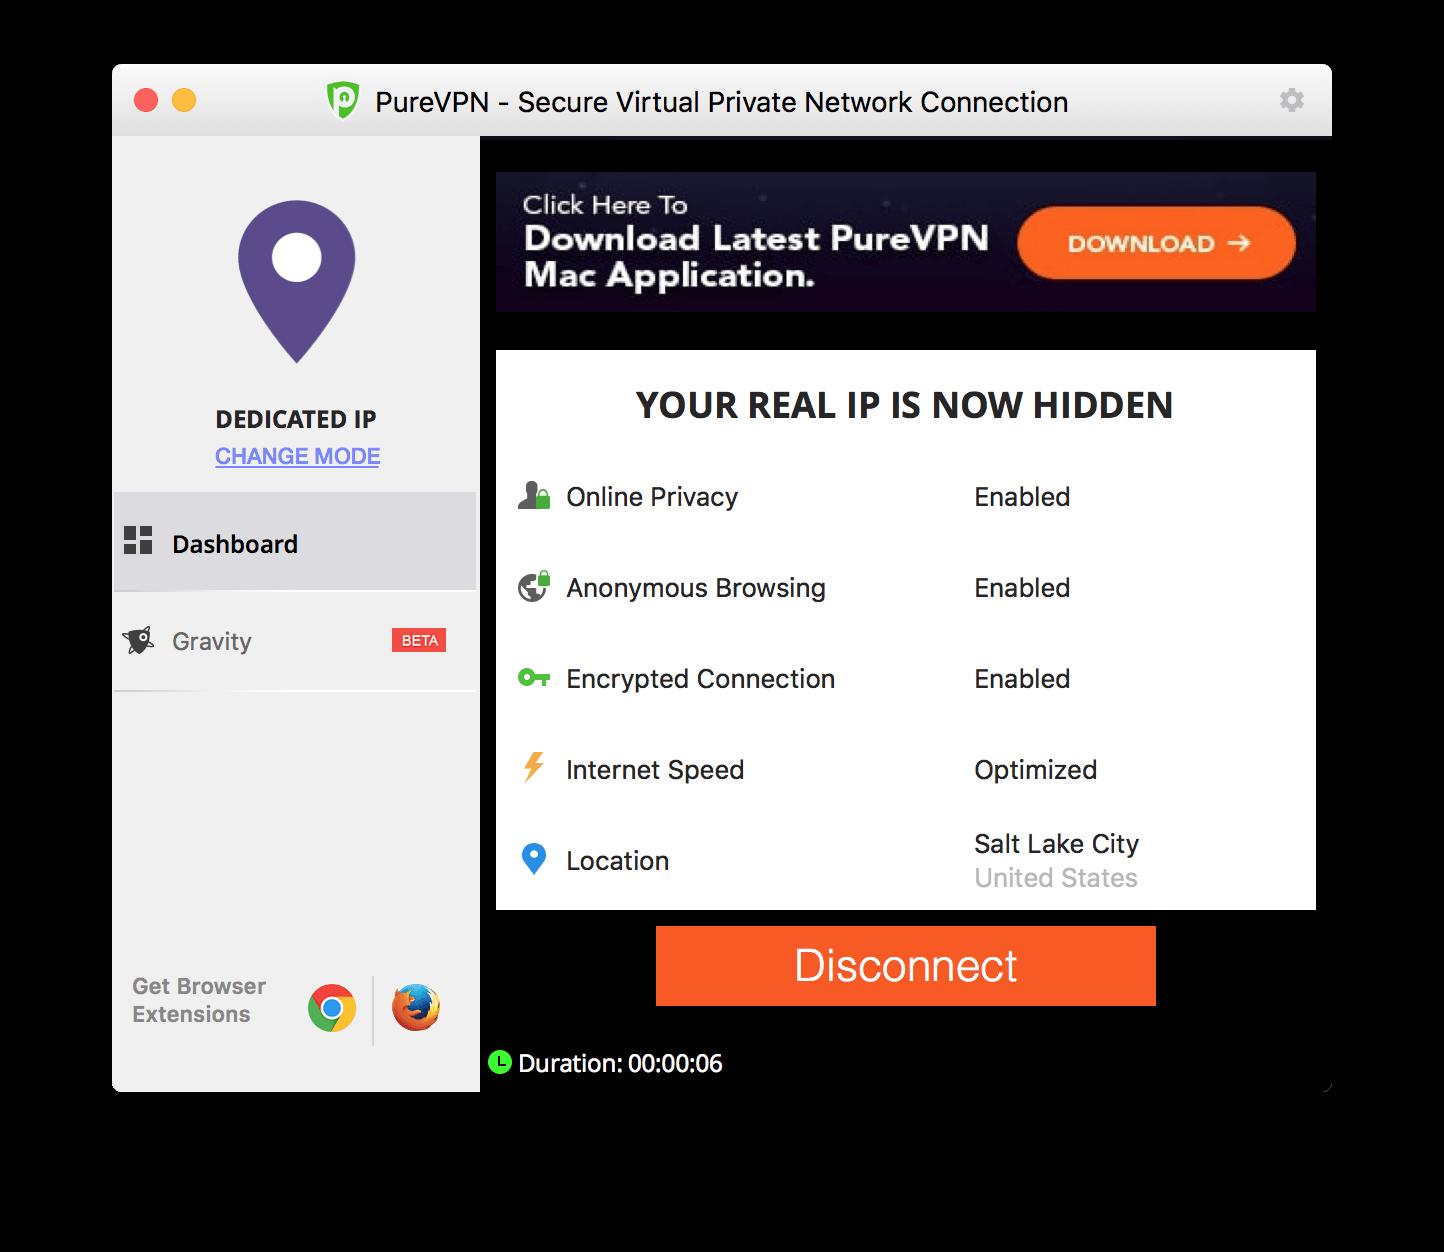 PureVPN's dedicated IP mode